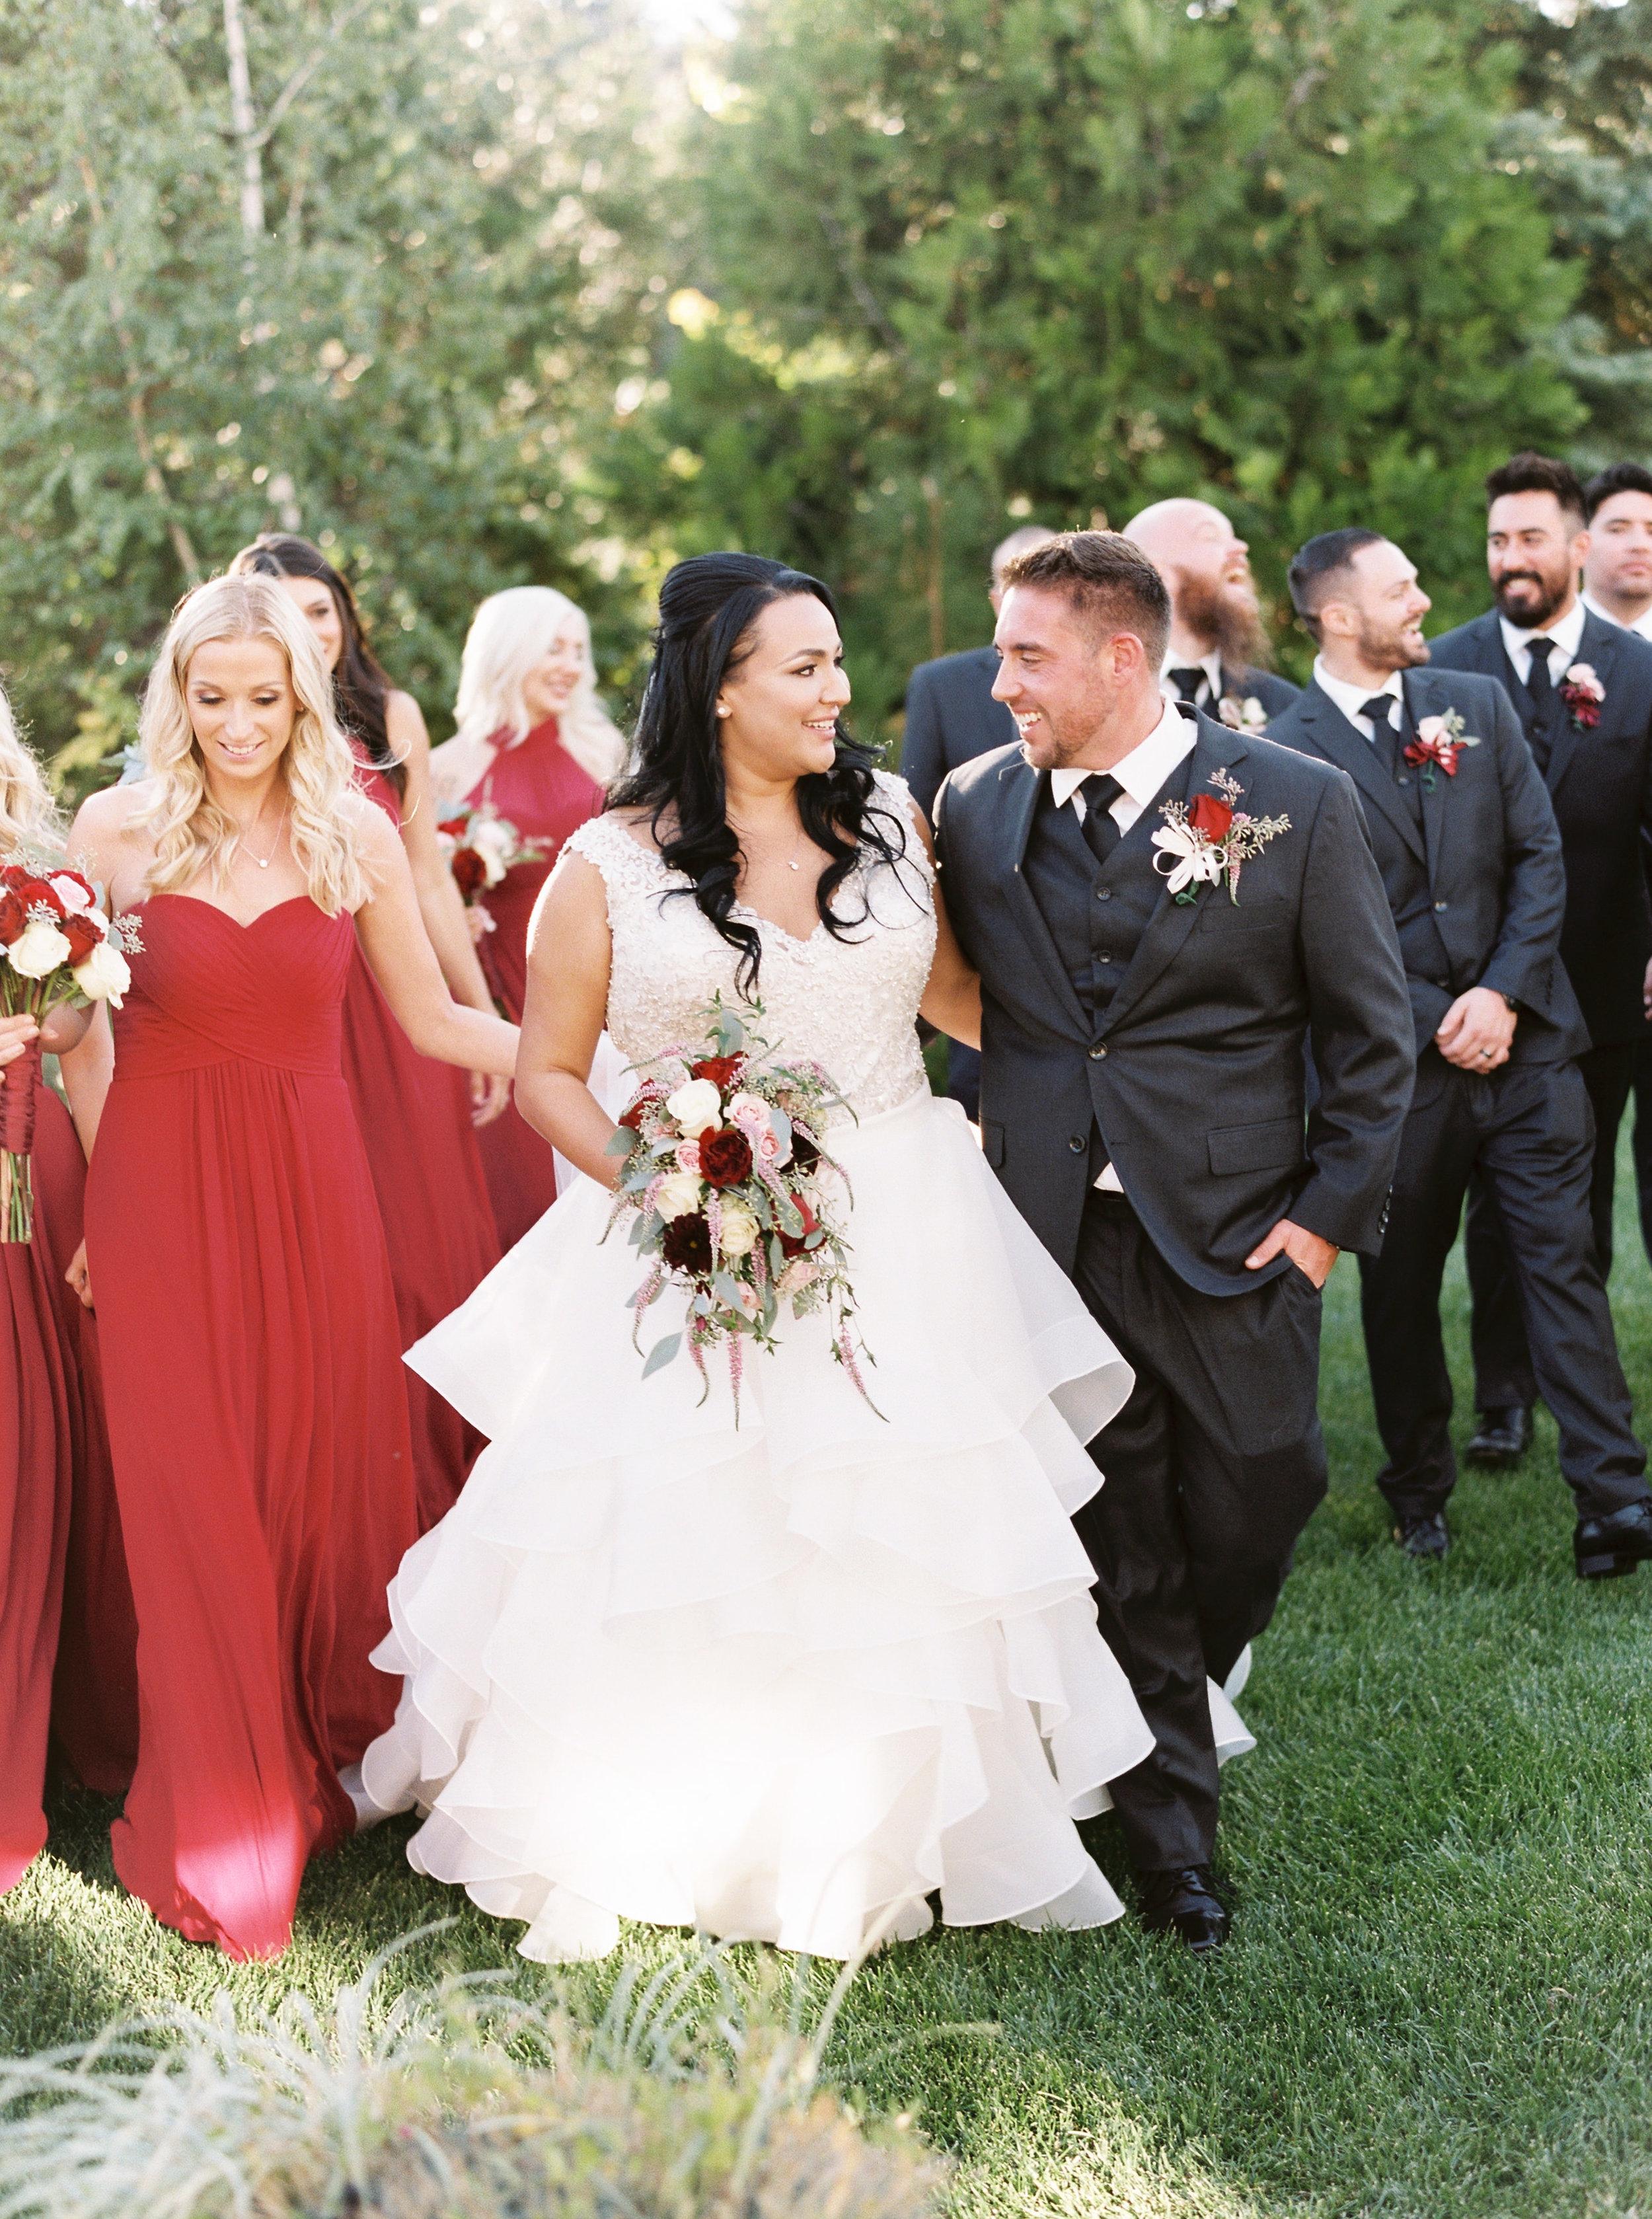 Tenaya-lodge-wedding-at-yosemite-national-park-california-34.jpg